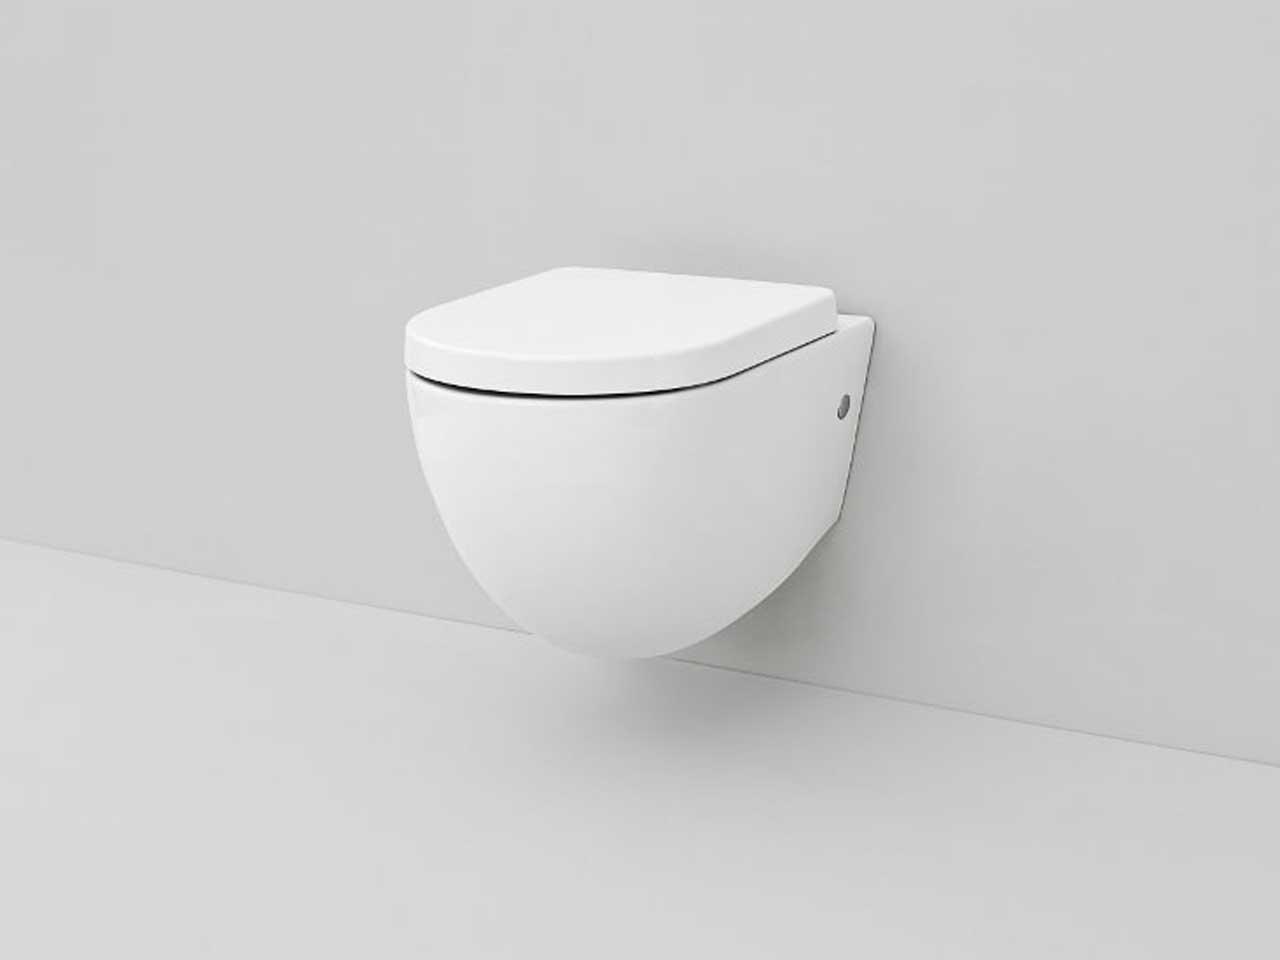 Sedili Wc Ikea : Sostituire sedile wc a muro free sedile wc asse copriwater ideal